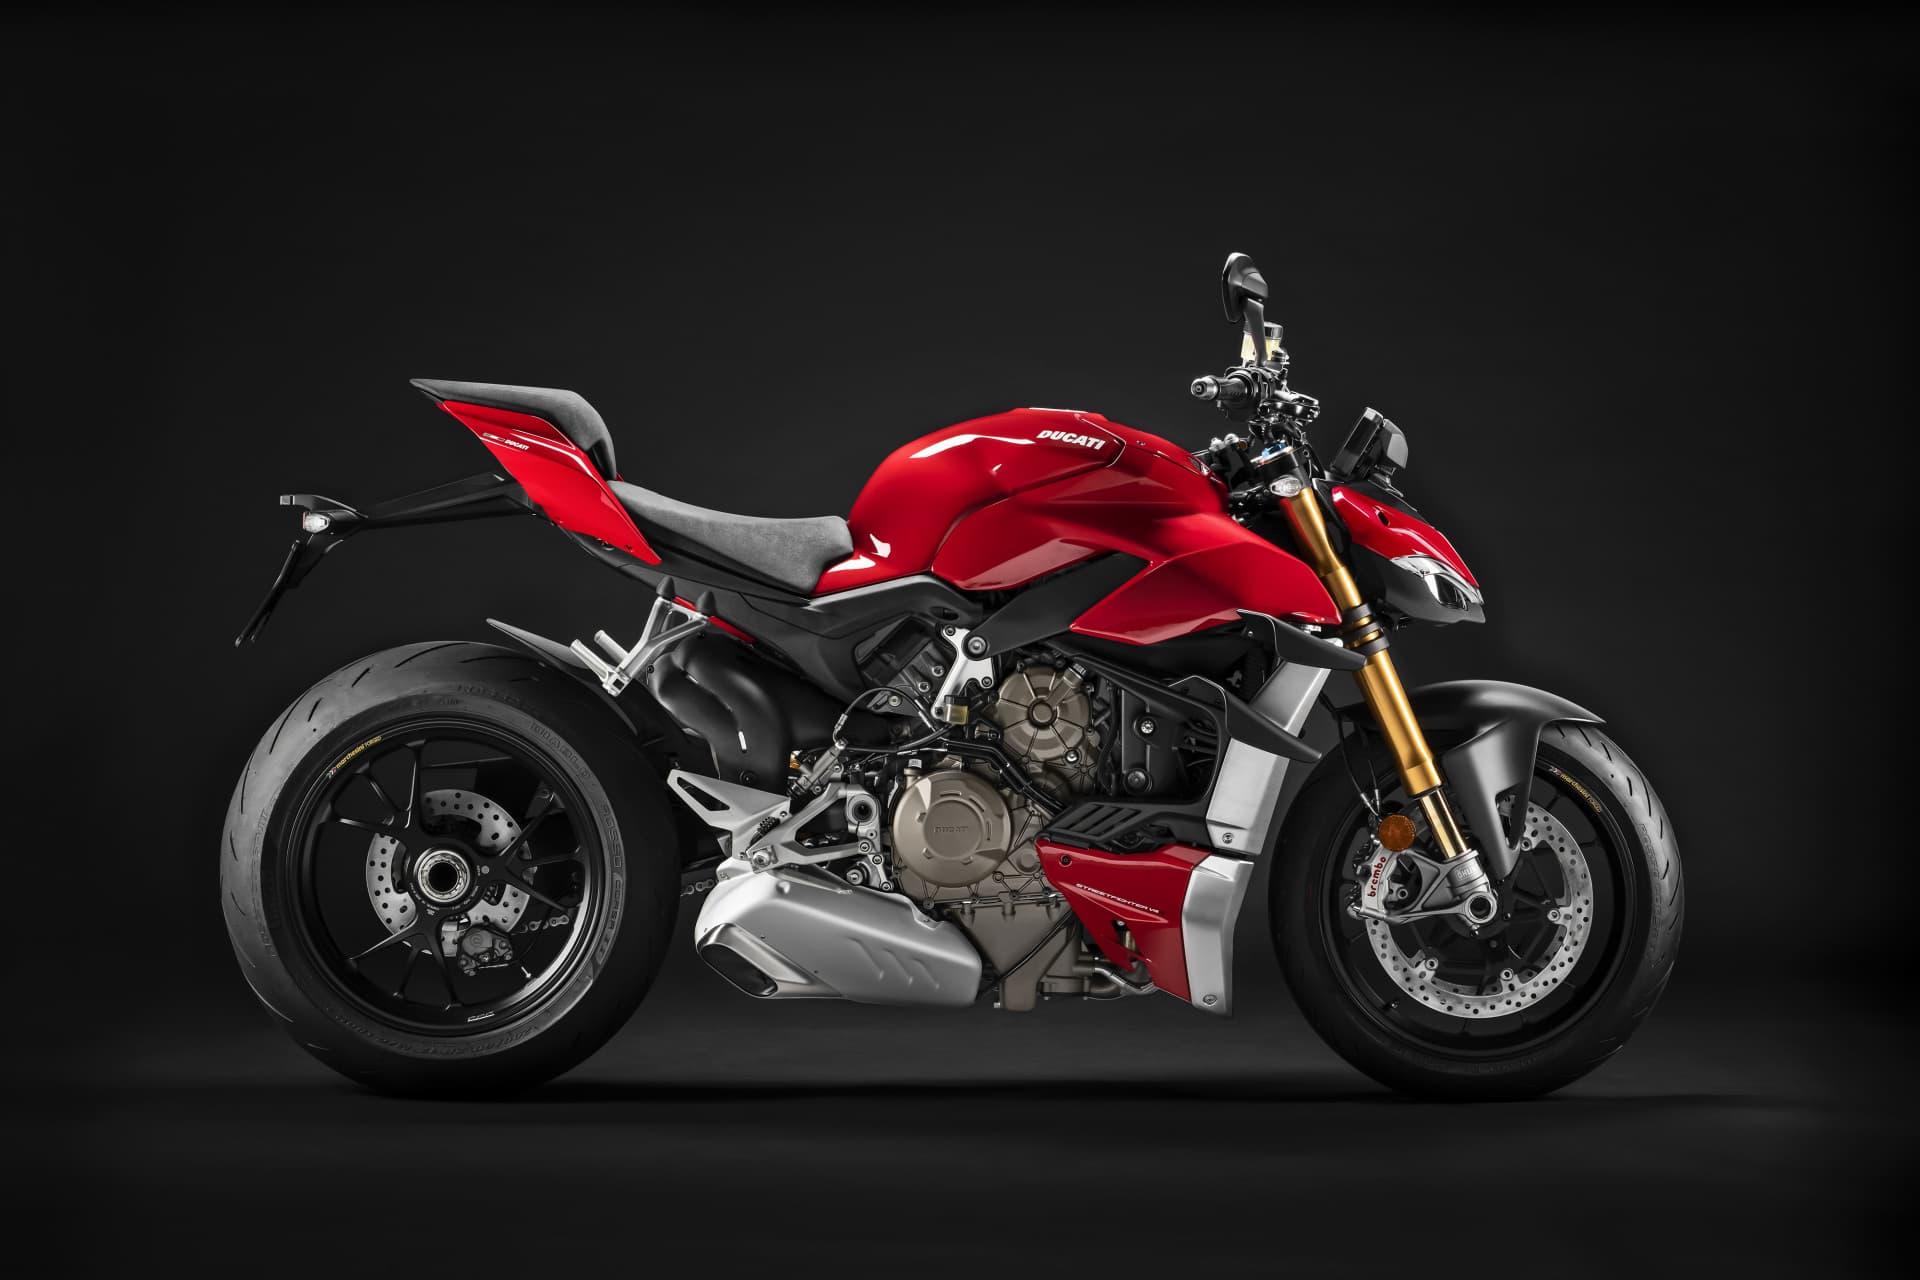 My20 Ducati Streetfigher V4 S 02 Uc101686 Mid